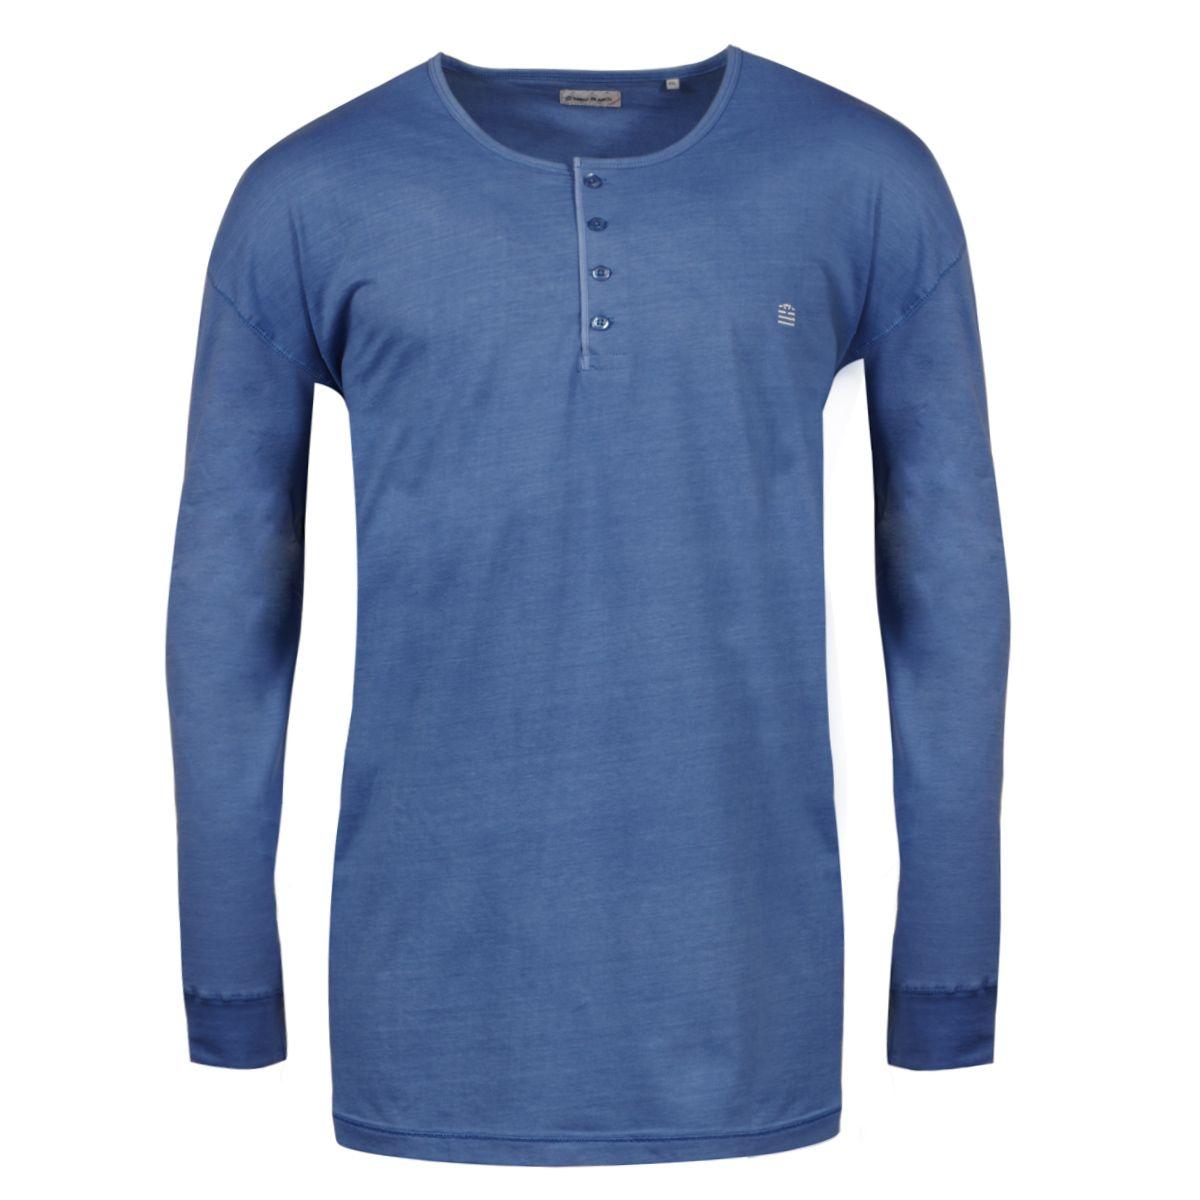 tee shirt manches longues col tunisien bleu grande taille du 3xl au 6xl size factory serge. Black Bedroom Furniture Sets. Home Design Ideas